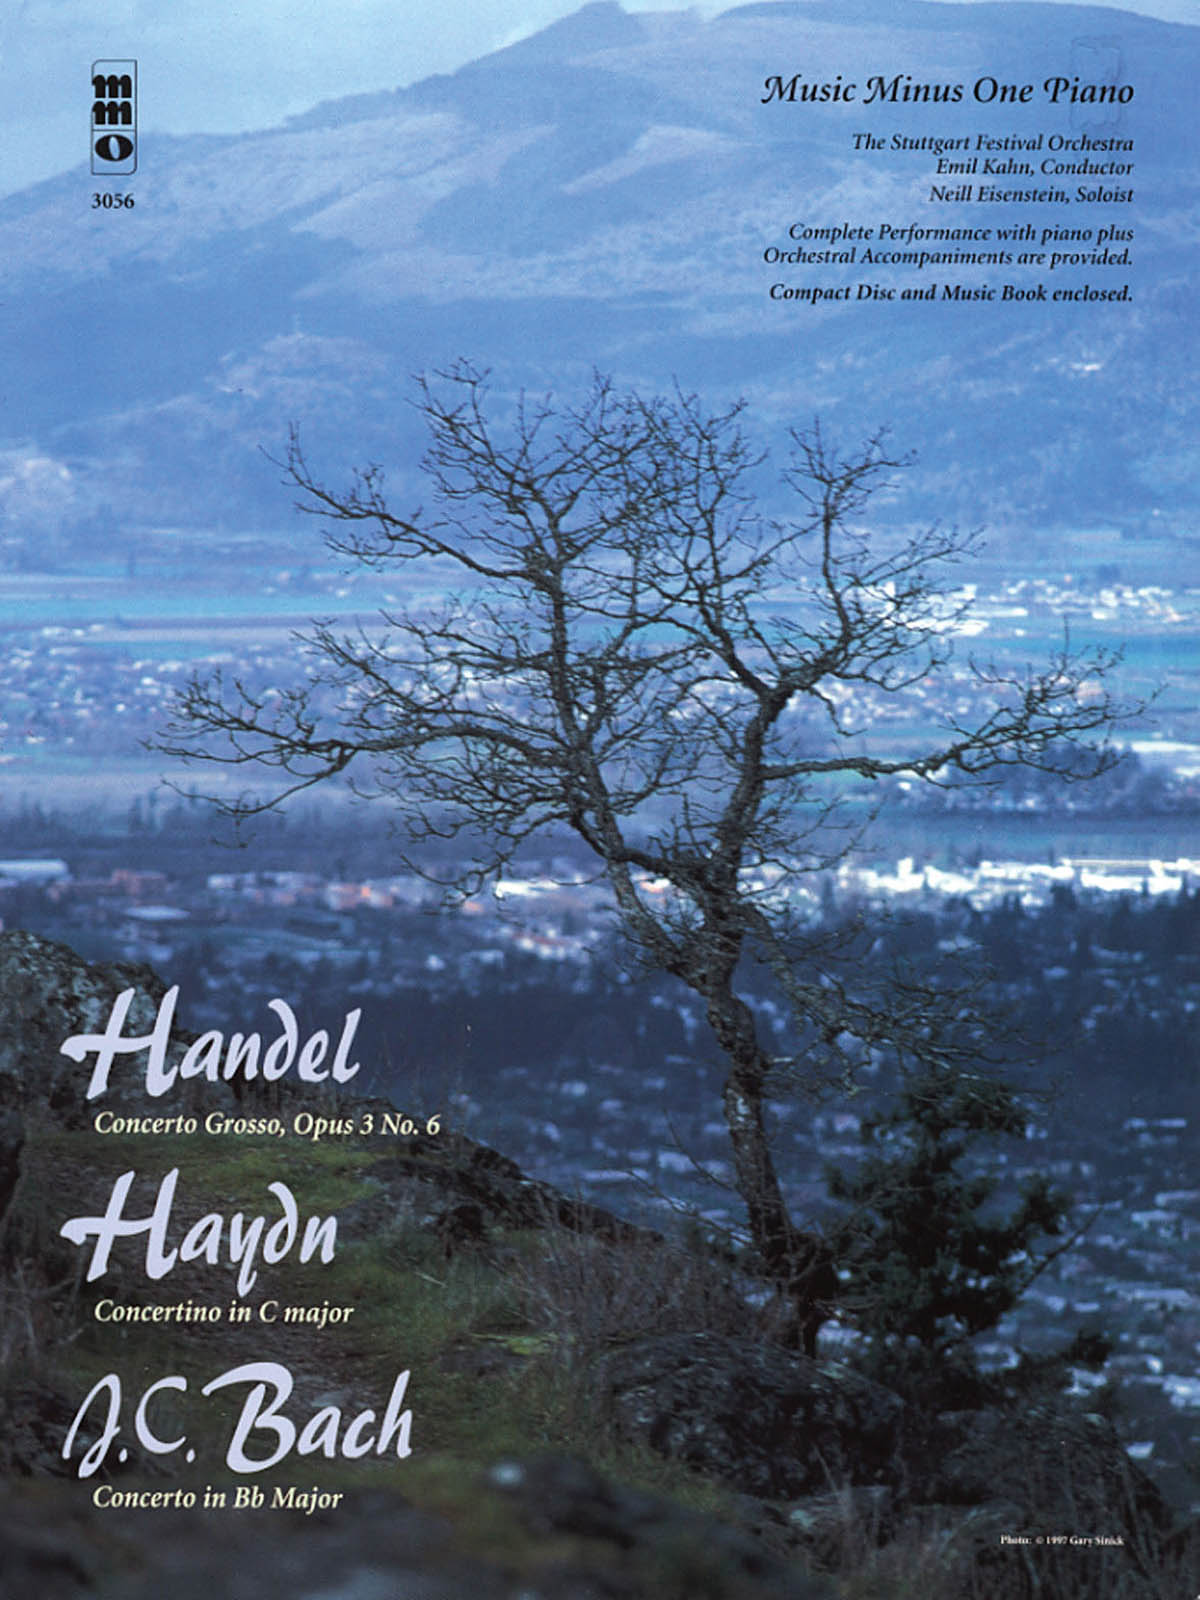 Georg Friedrich Händel Franz Joseph Haydn J.C. Bach: Concerto Grosso  Op. 3  No.